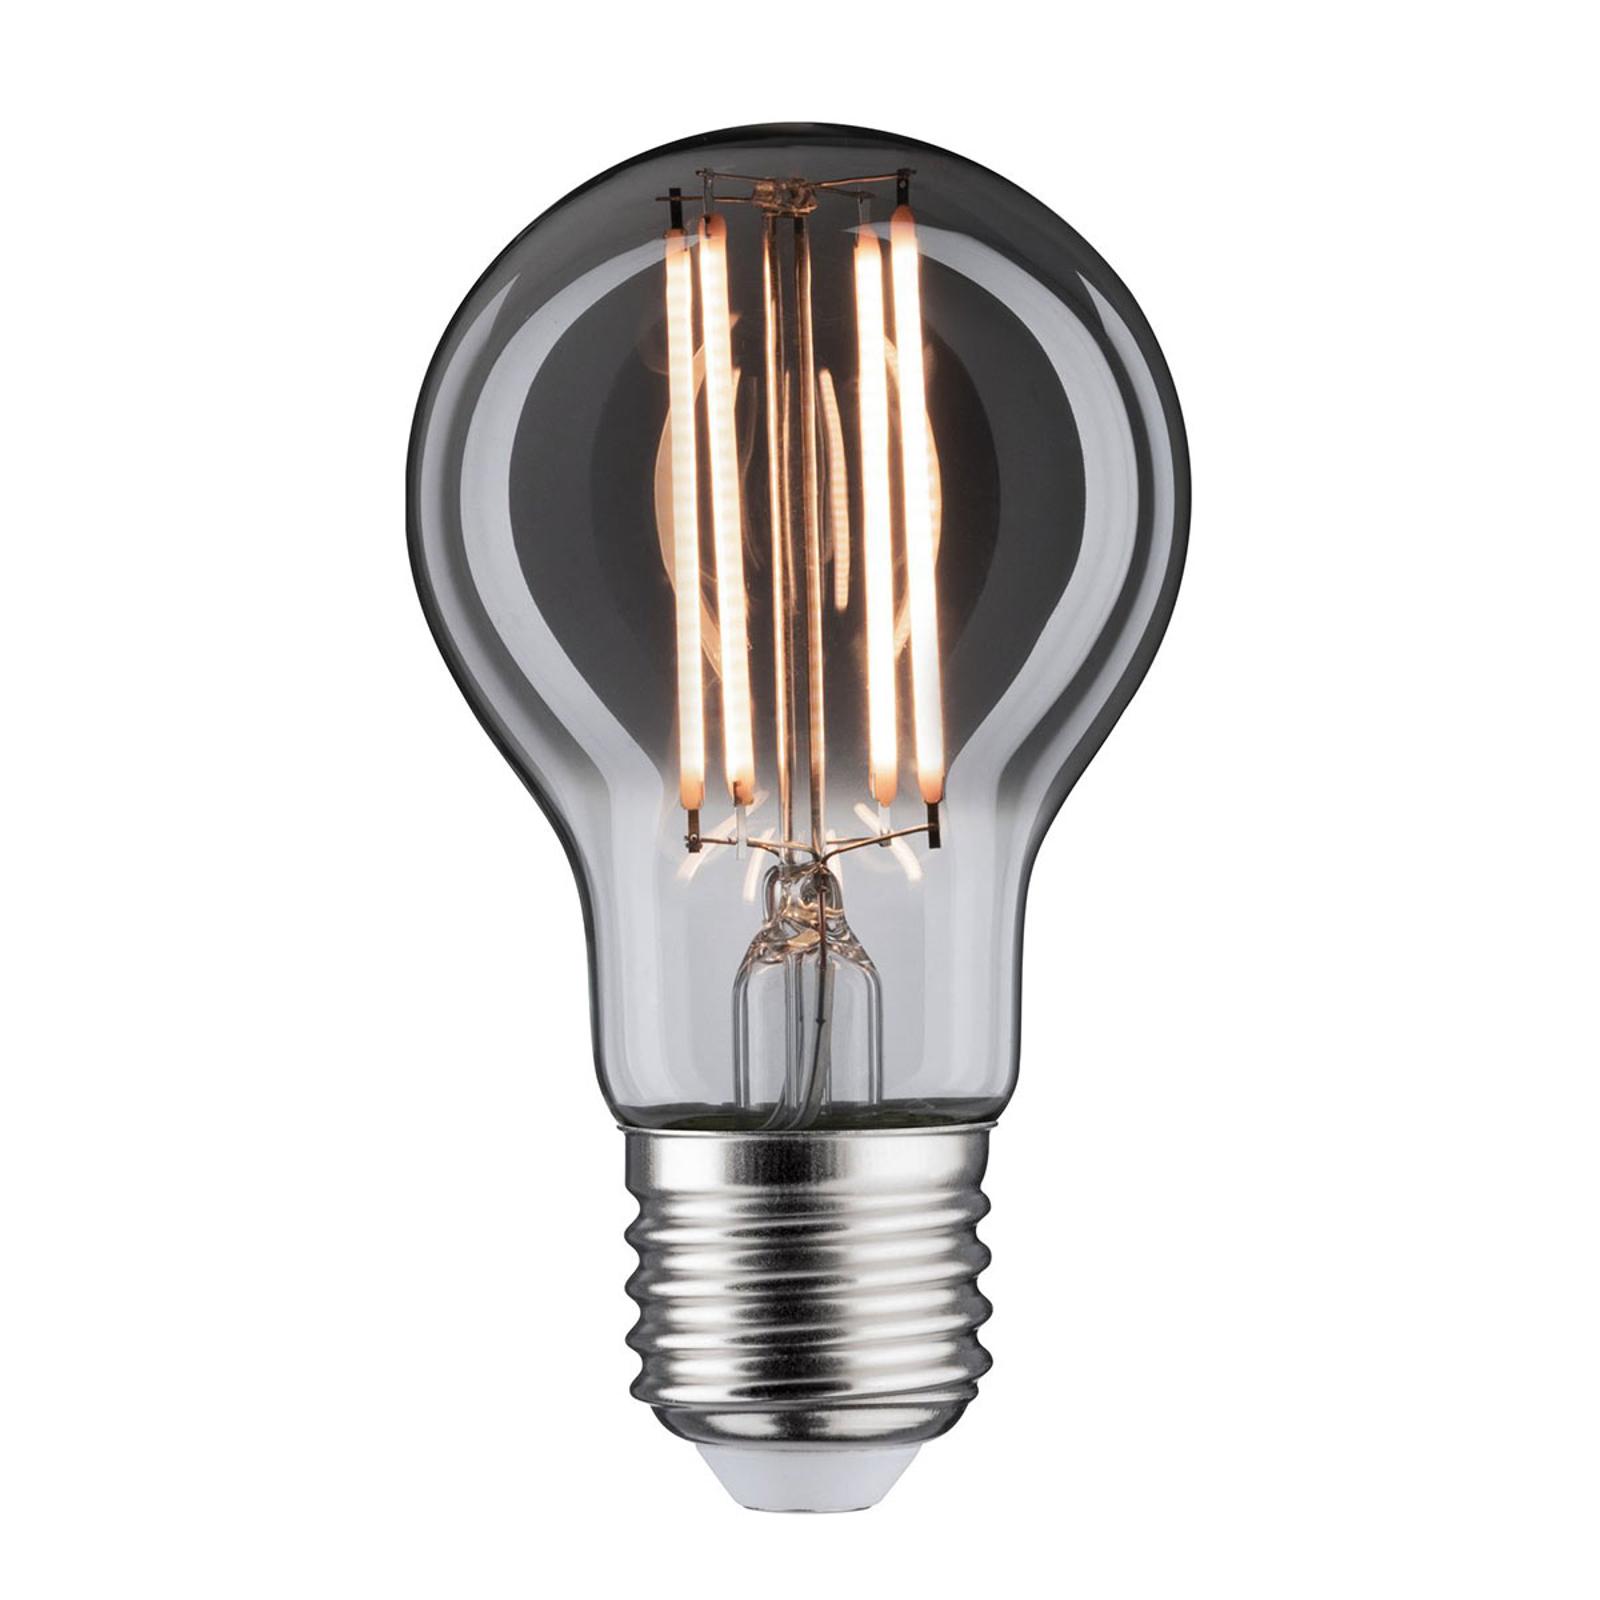 LED-Lampe E27 7,5W 2.200K Rauchglas, dimmbar